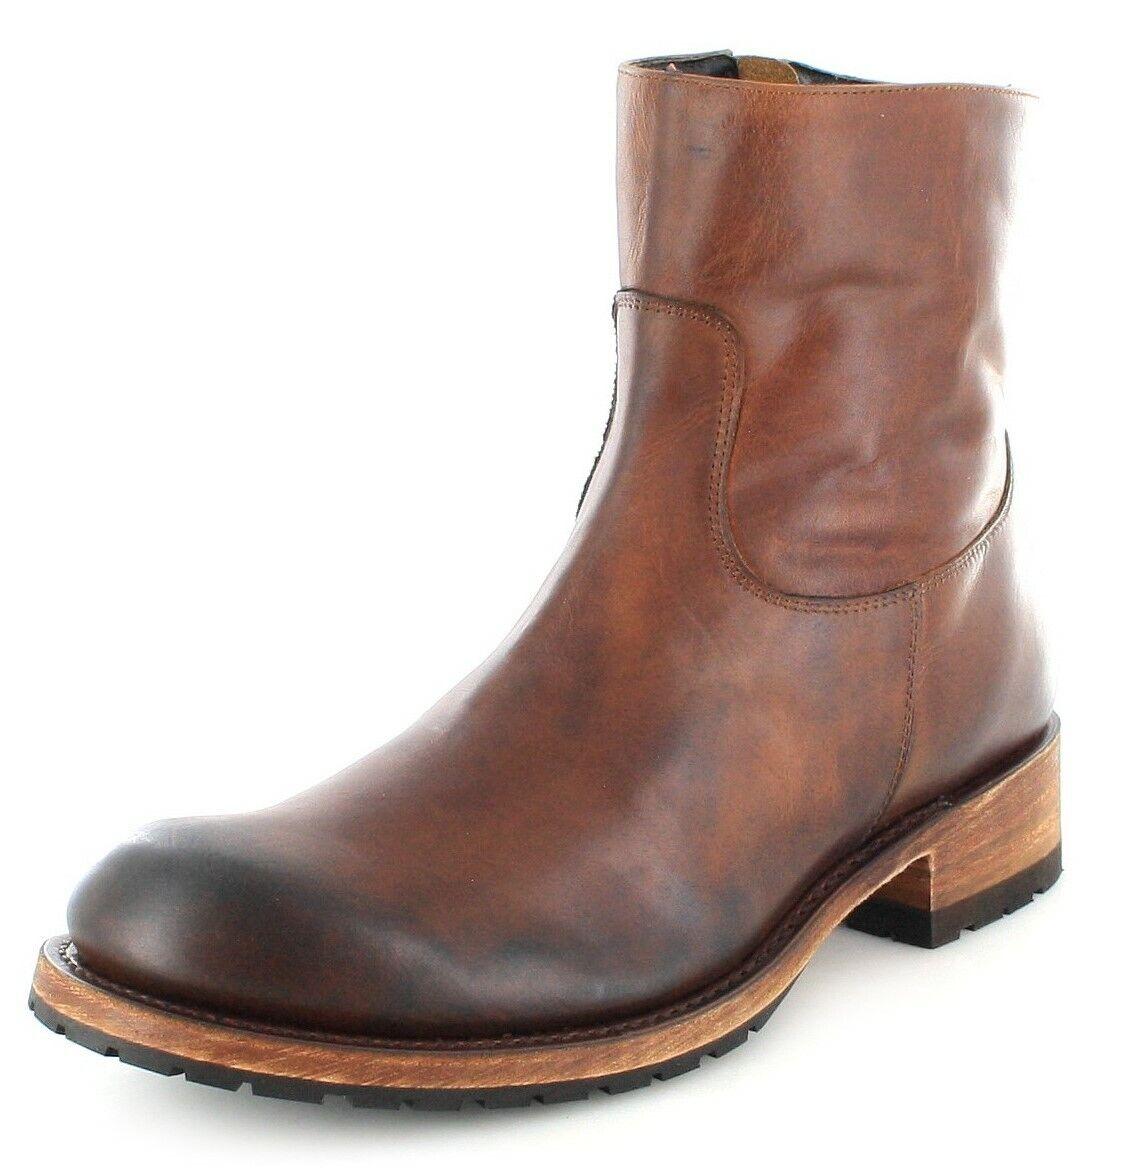 Sendra Stiefel 9491 Evolution Tang Herren Lederstiefel Braun Chelsea Stiefel